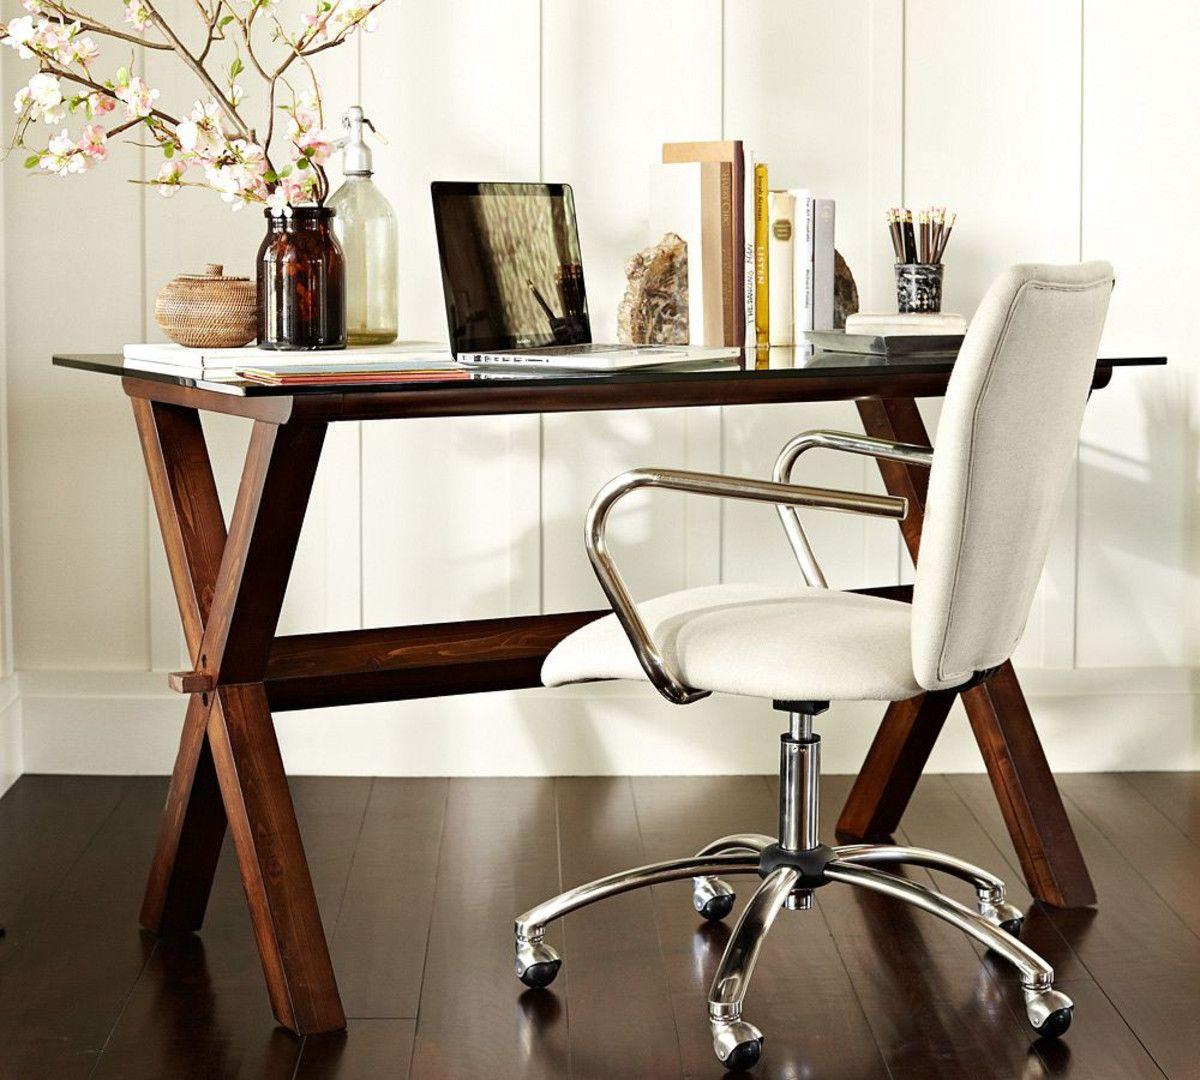 airgo swivel desk chair lounge chairs ava wood espresso stain pottery barn australia